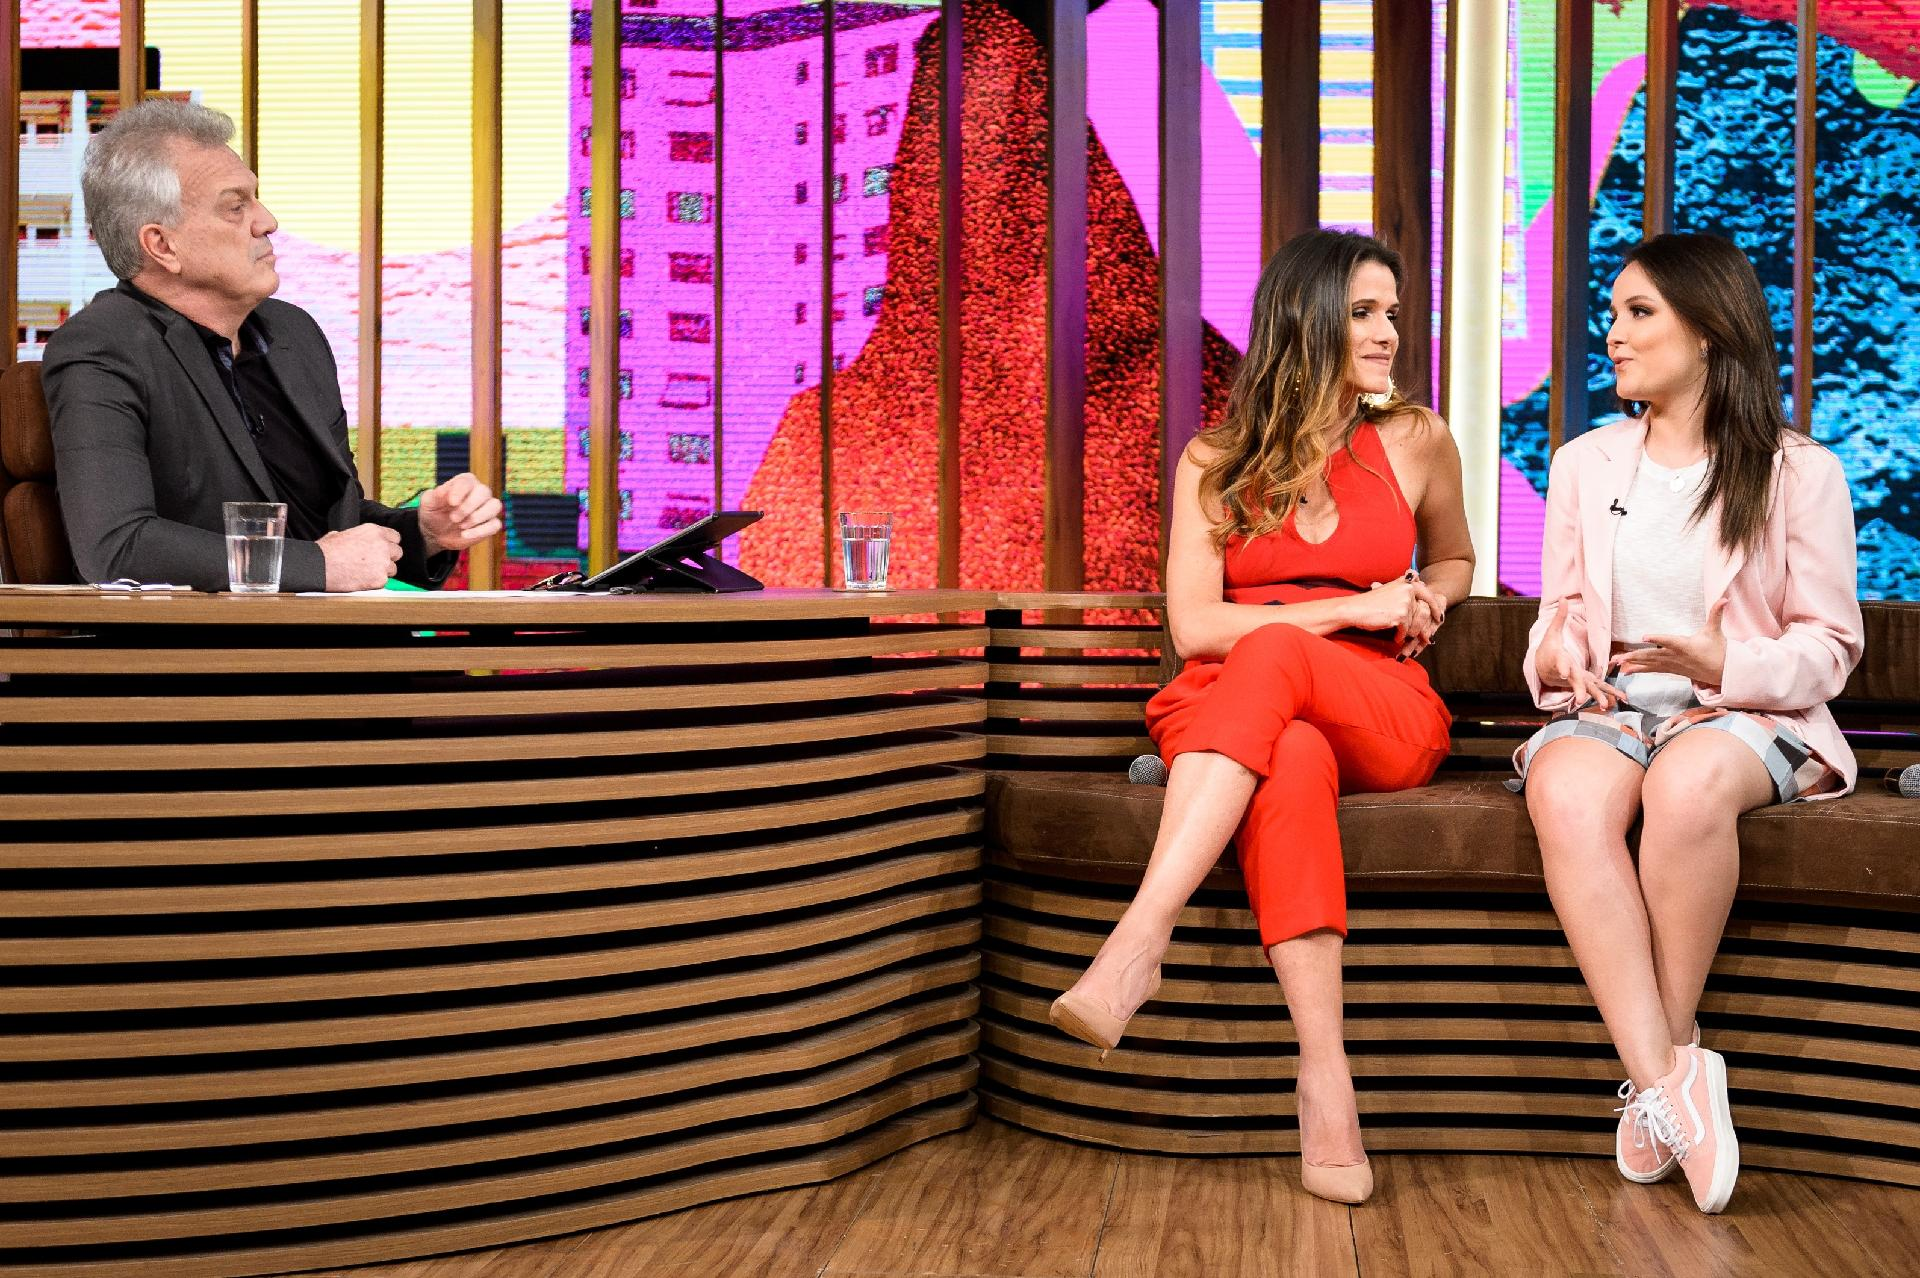 0c5c400b4b8 Larissa Manoela na Globo é caminho sem volta - 20 12 2017 - UOL  Entretenimento